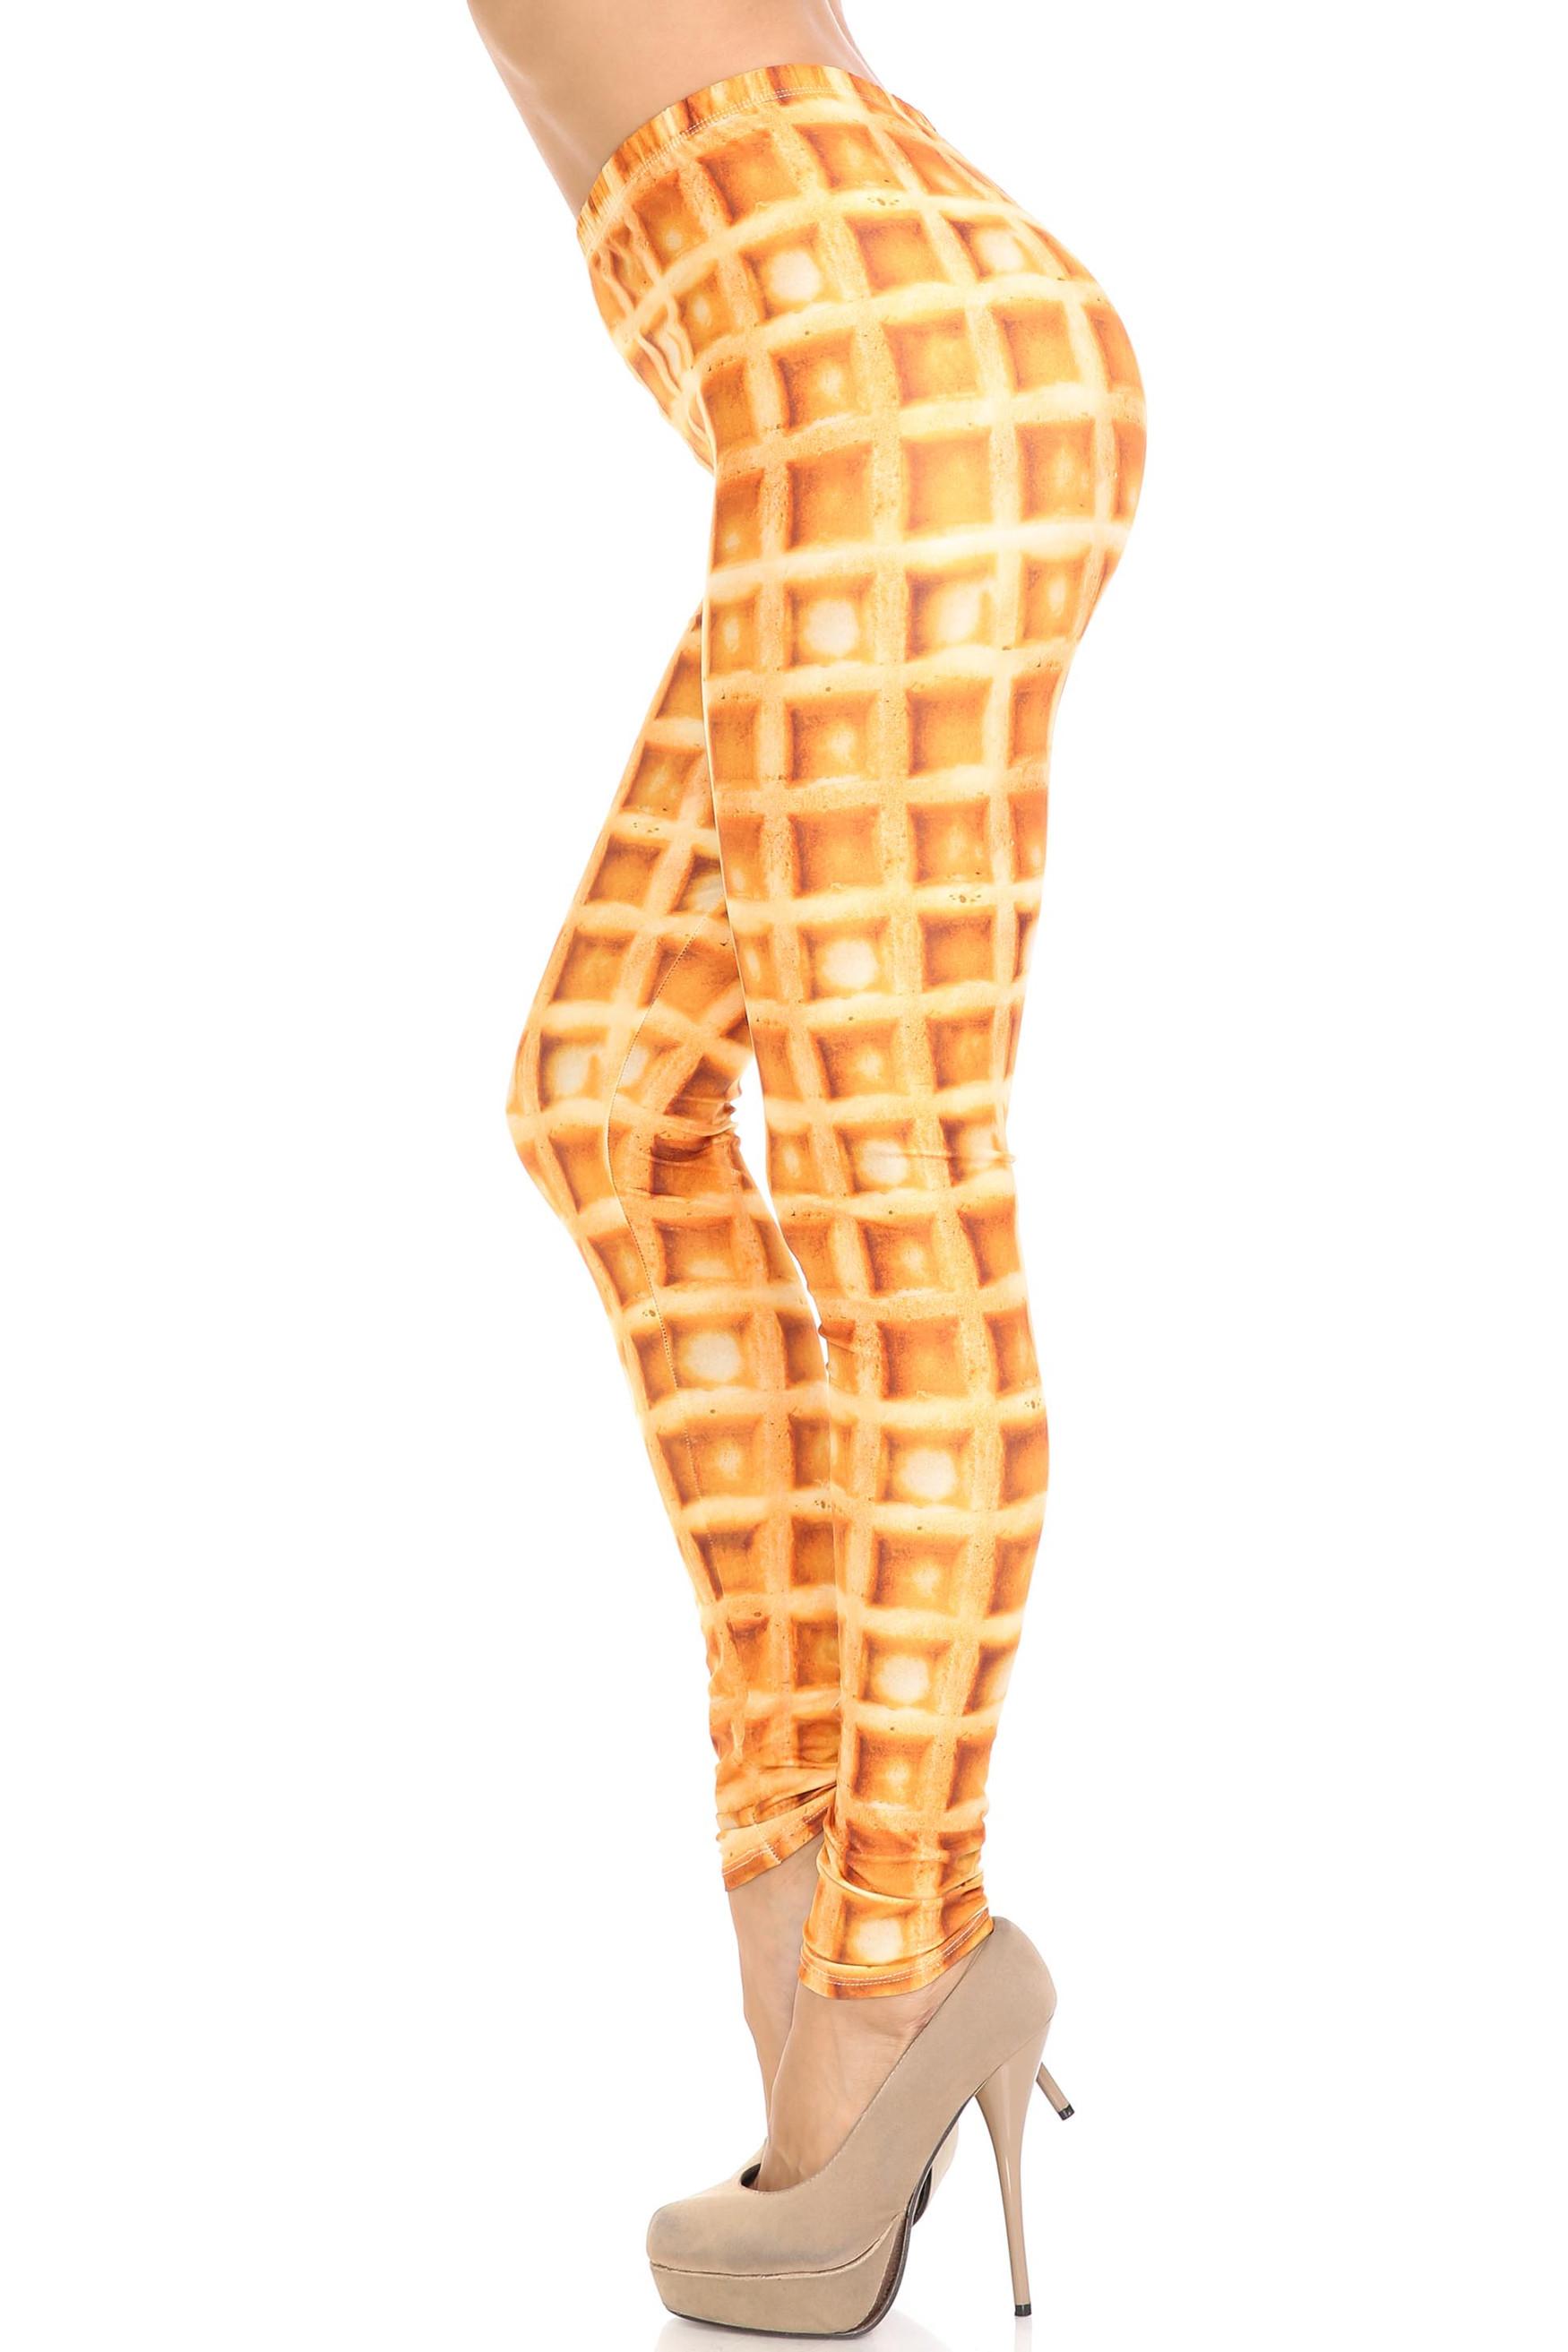 Creamy Soft Waffle Leggings - By USA Fashion™